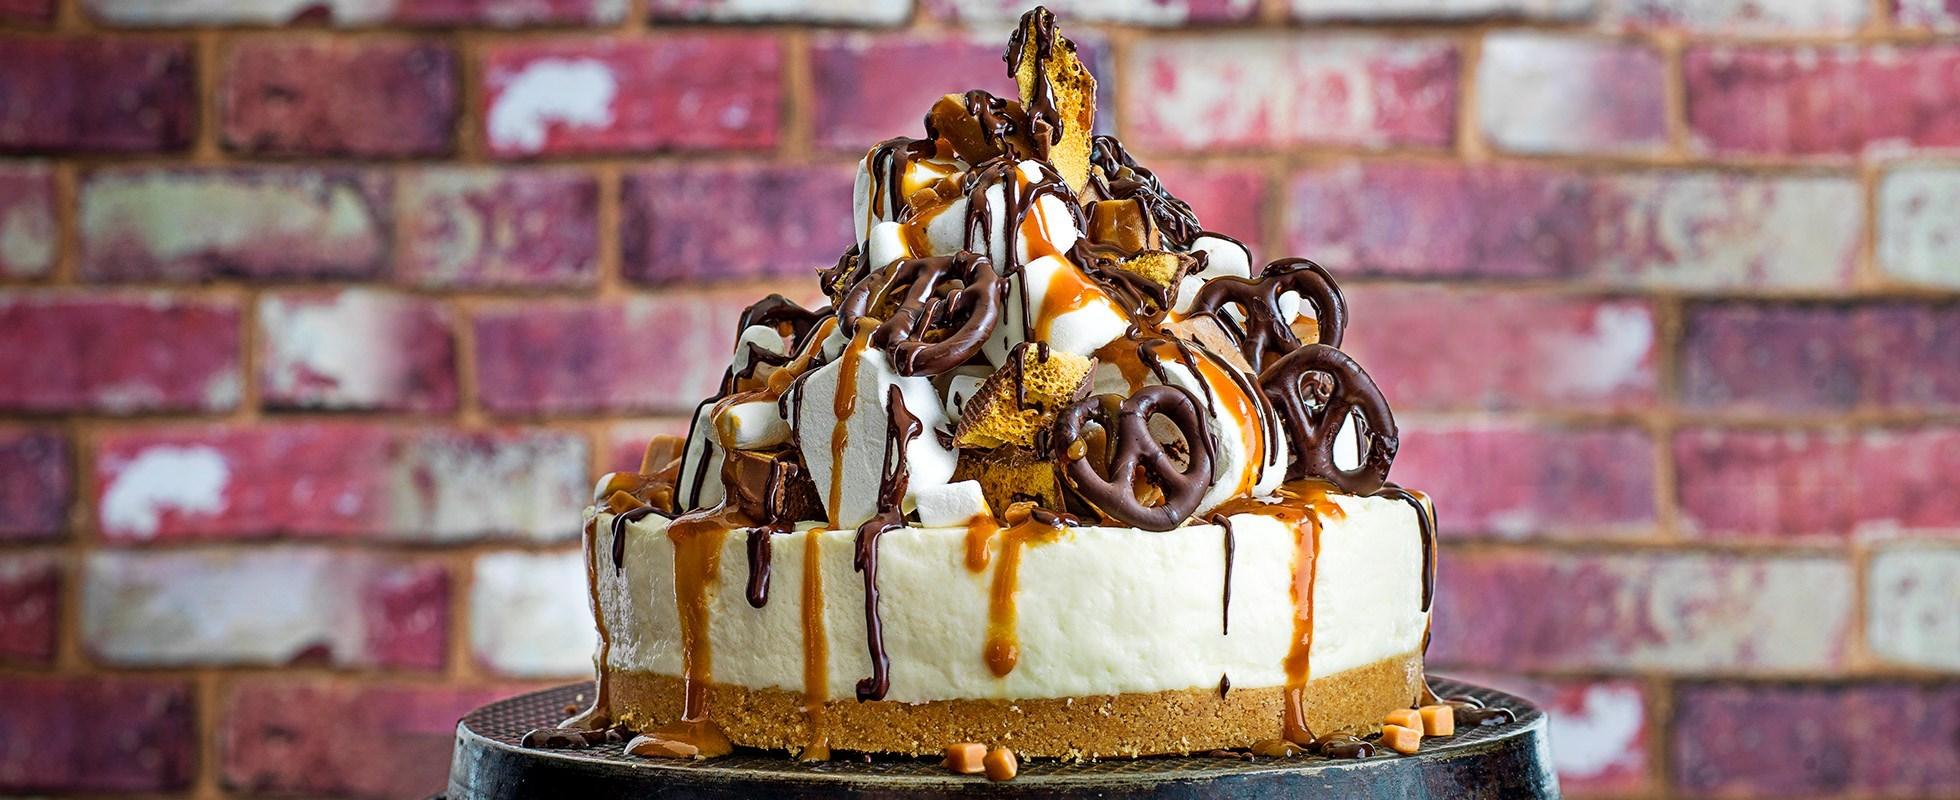 freakshake cheesecake